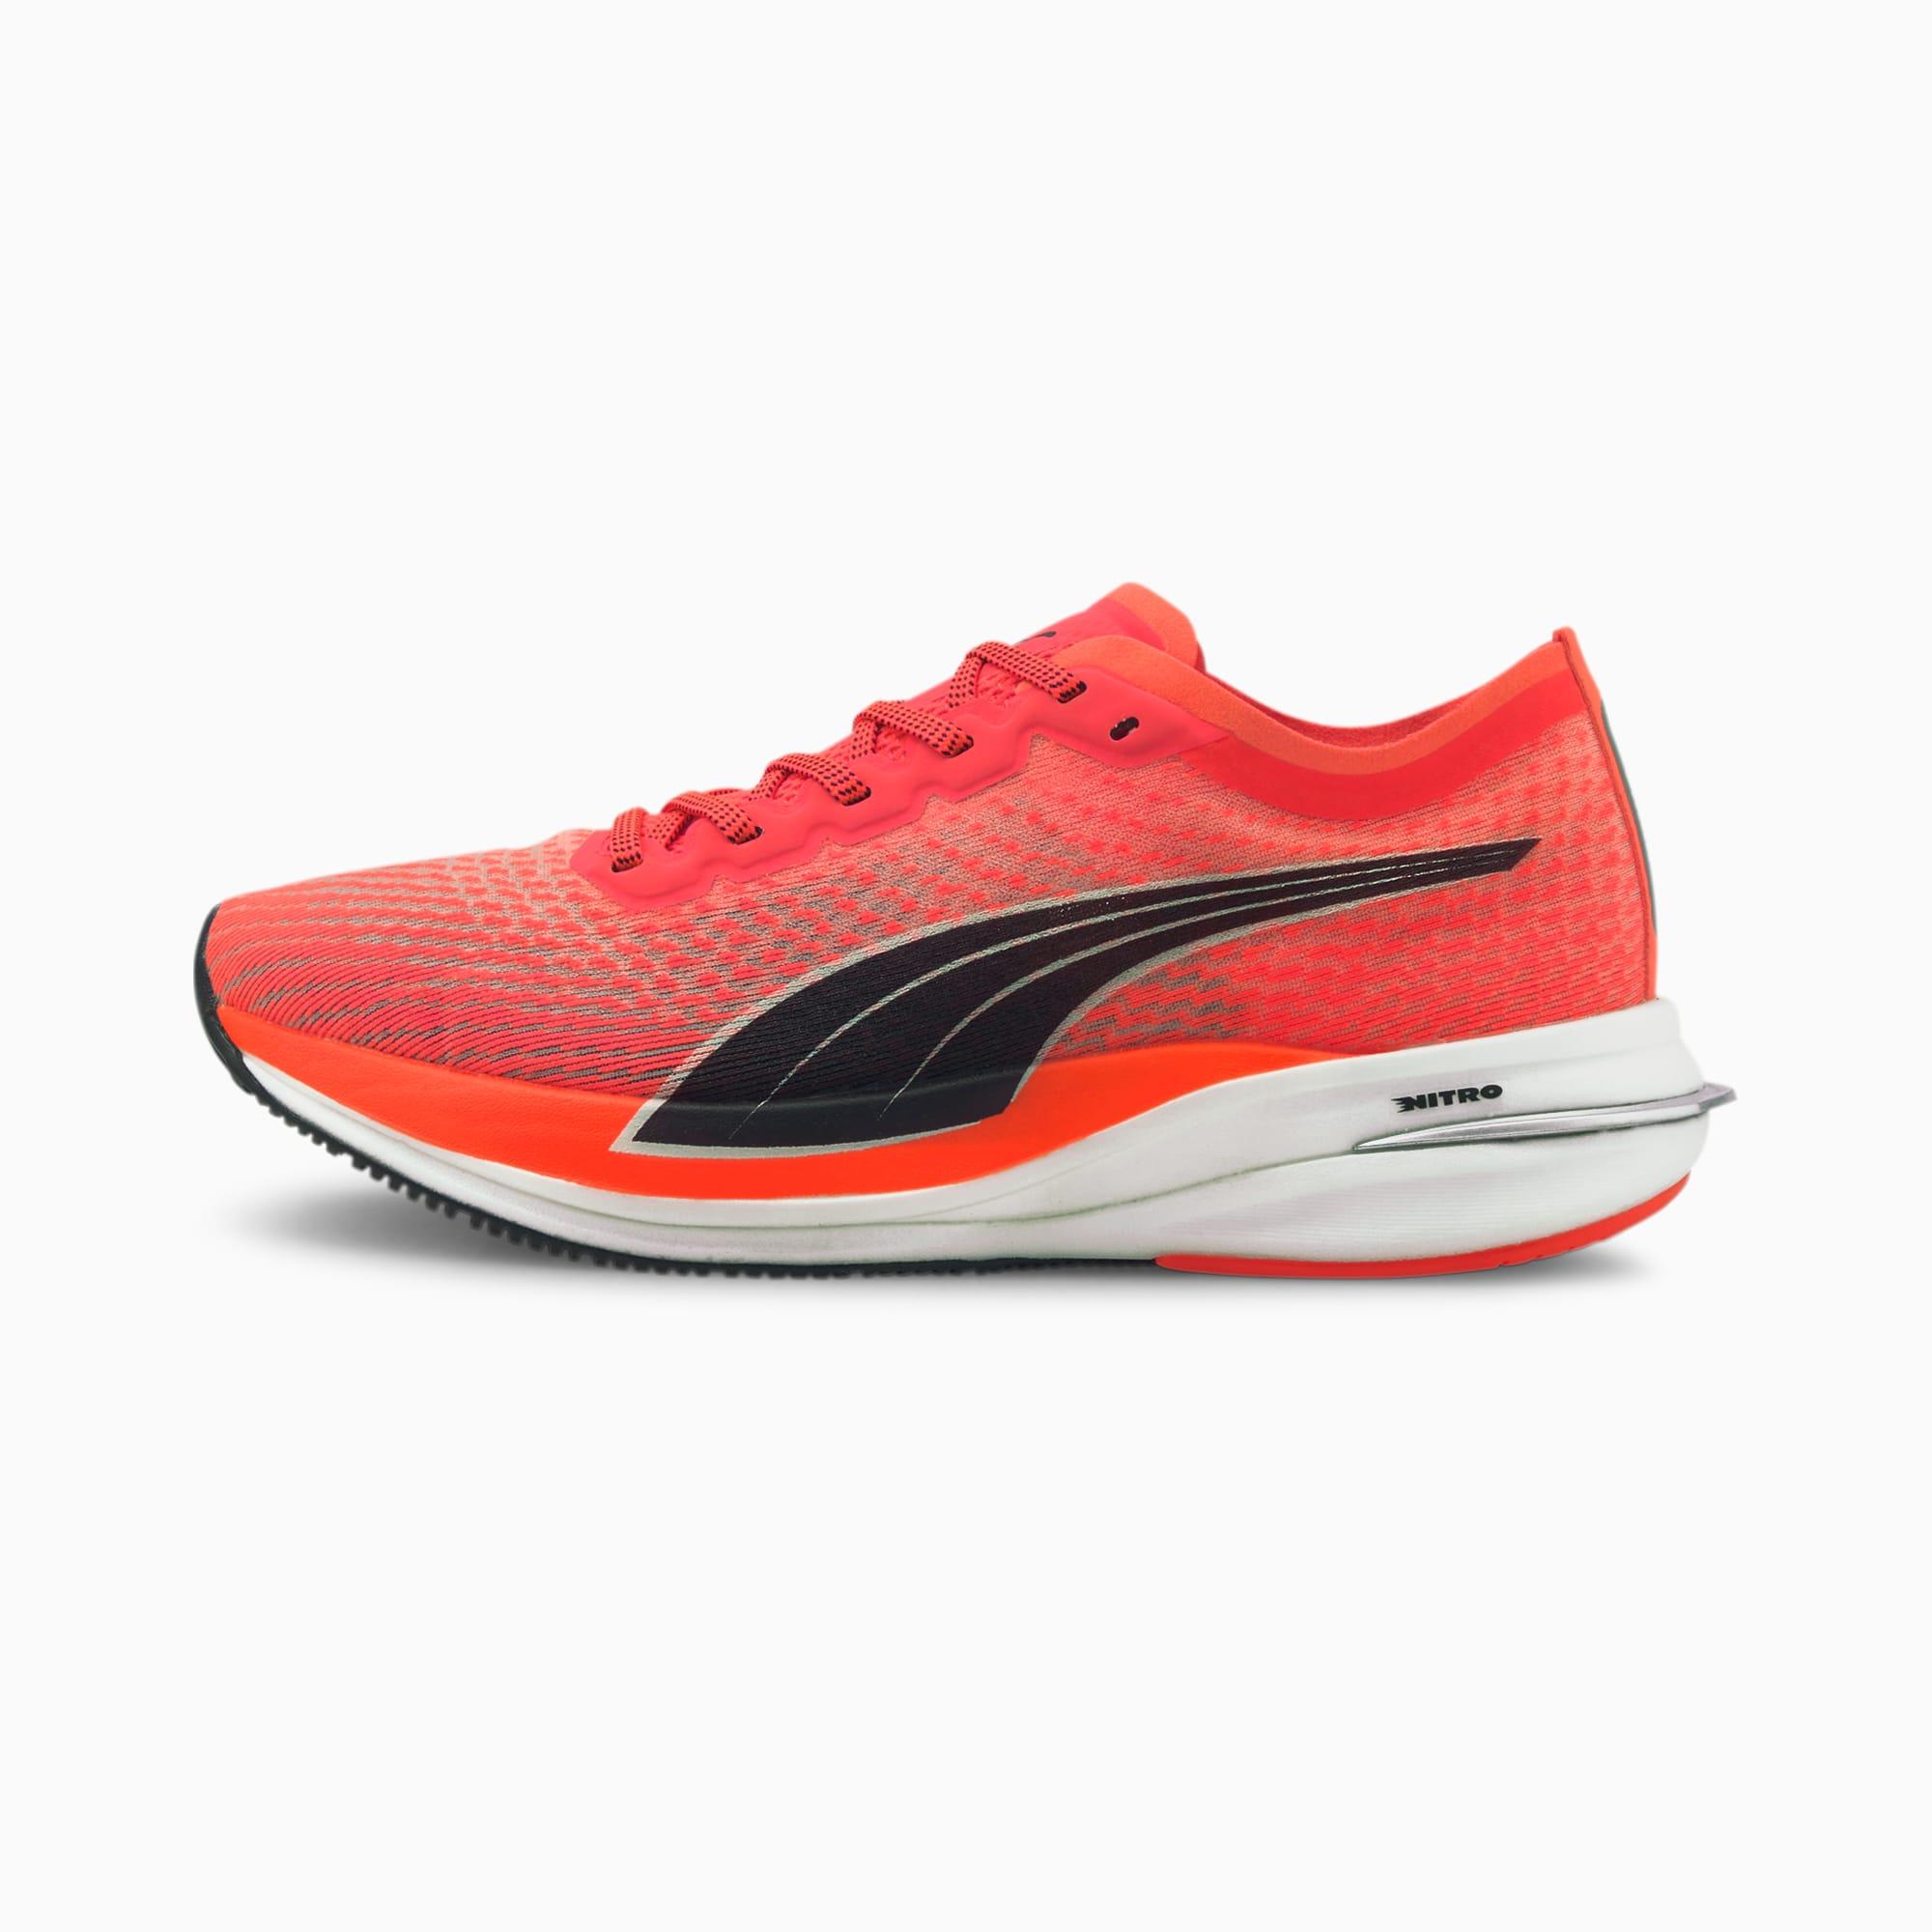 Deviate NITRO Women's Running Shoes